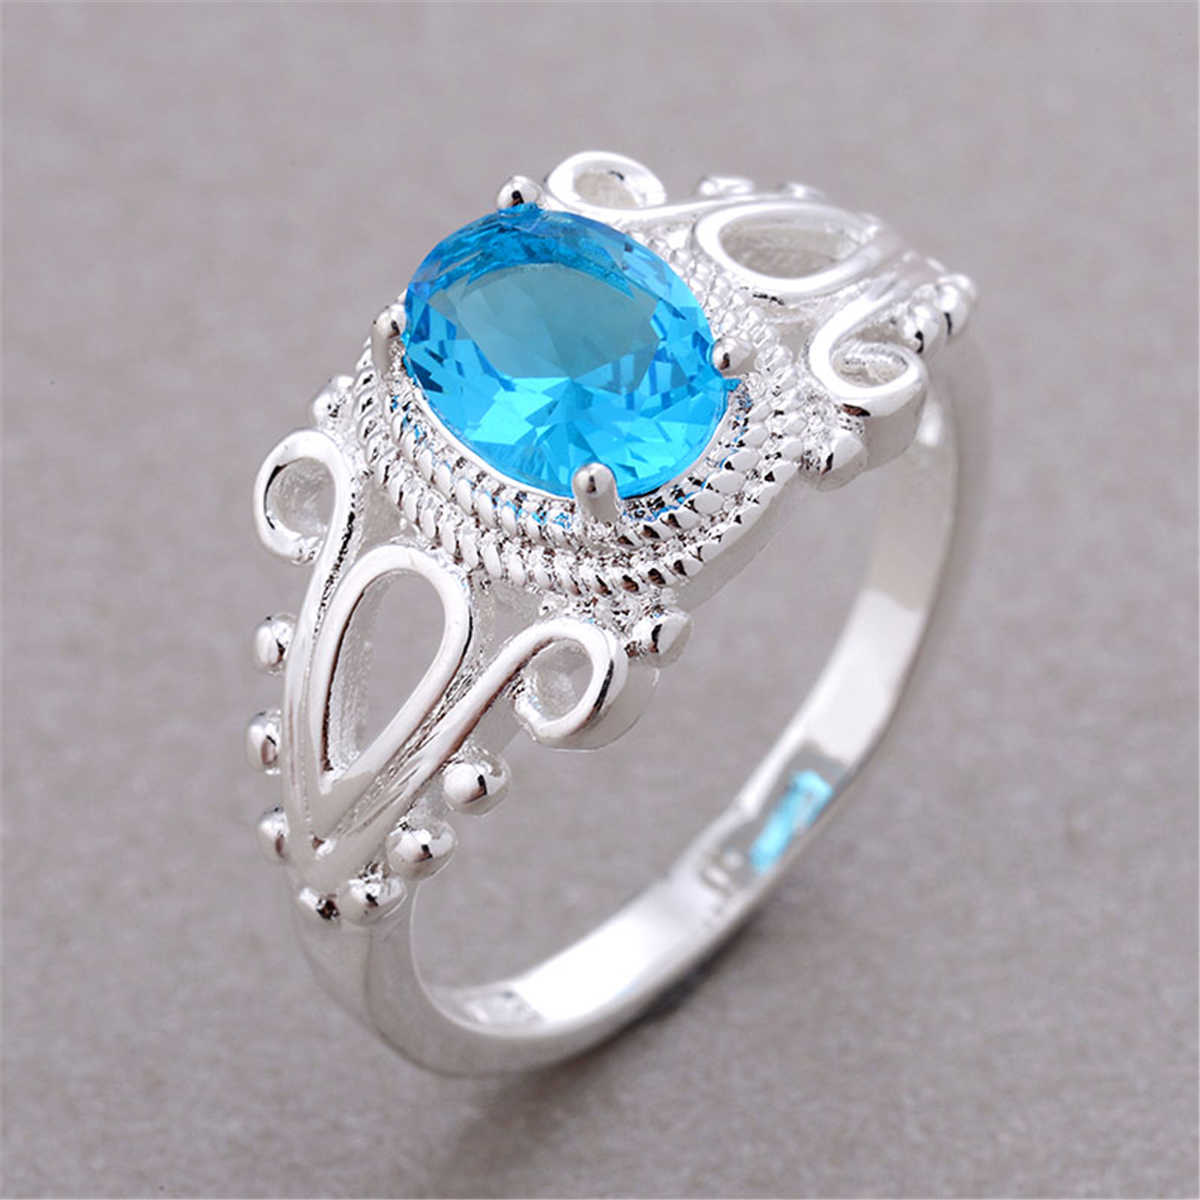 Sky Blue Stone Rings For Women Wedding Engagement Ring October